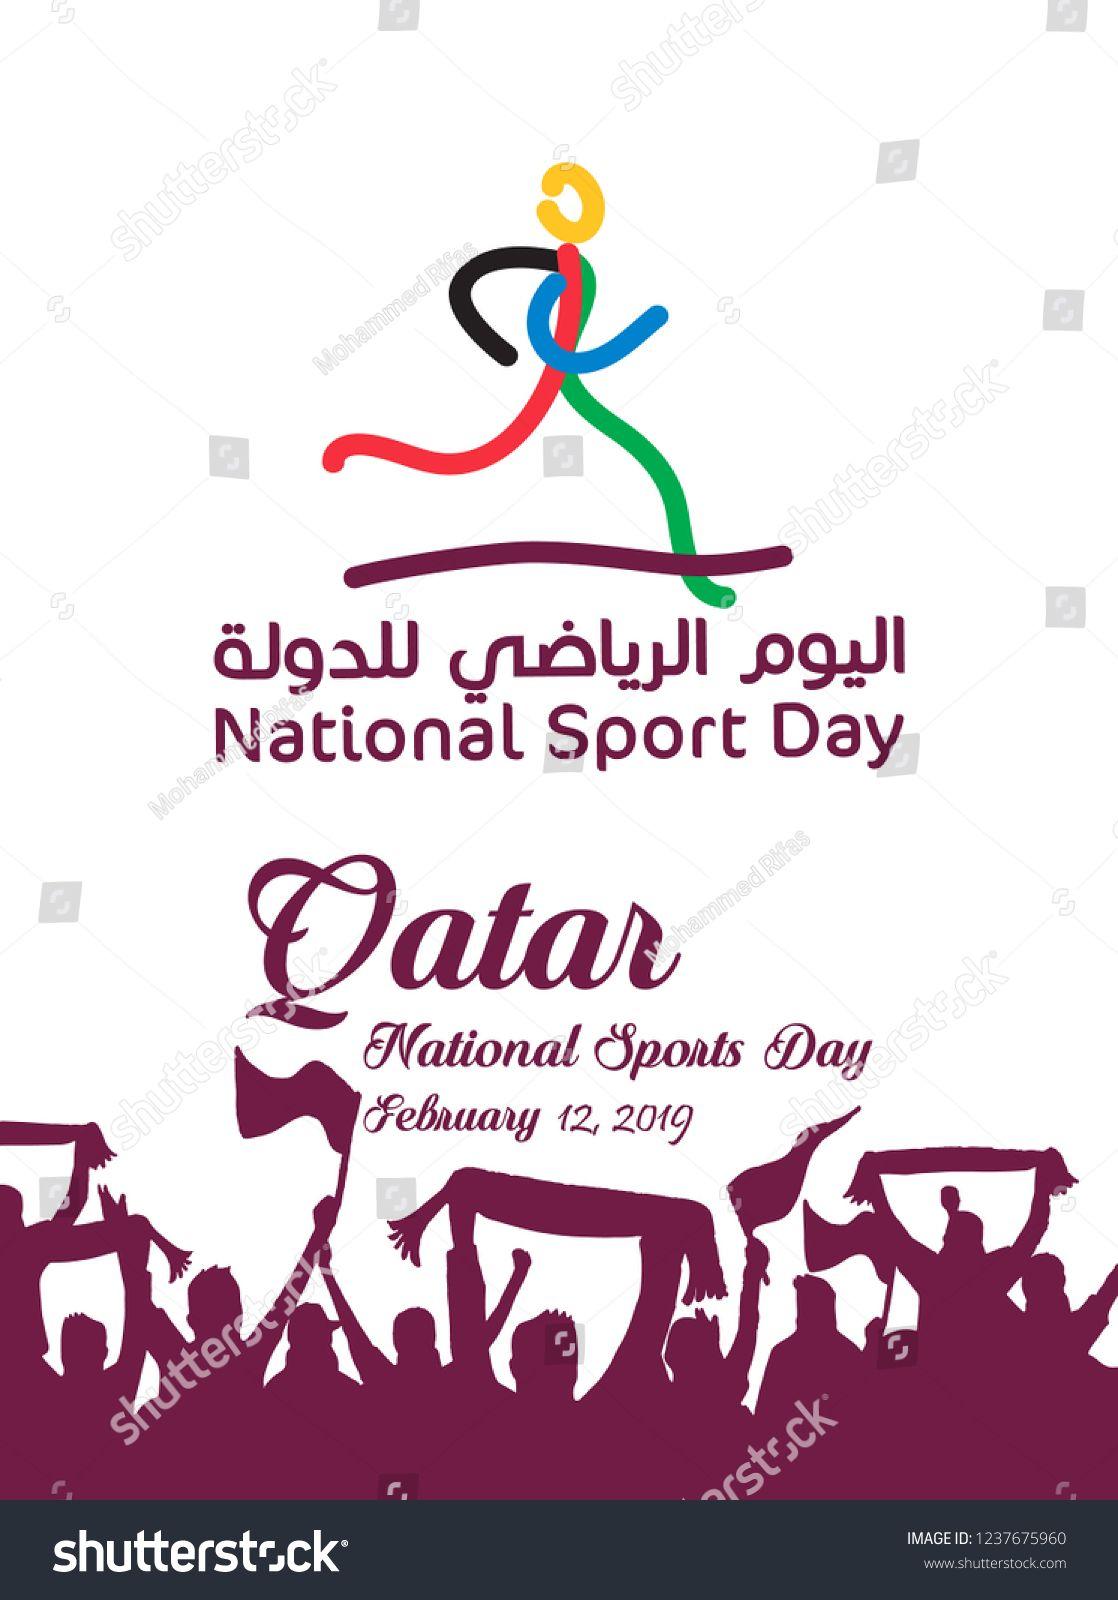 Qatar National Sports Day Logo , translate National